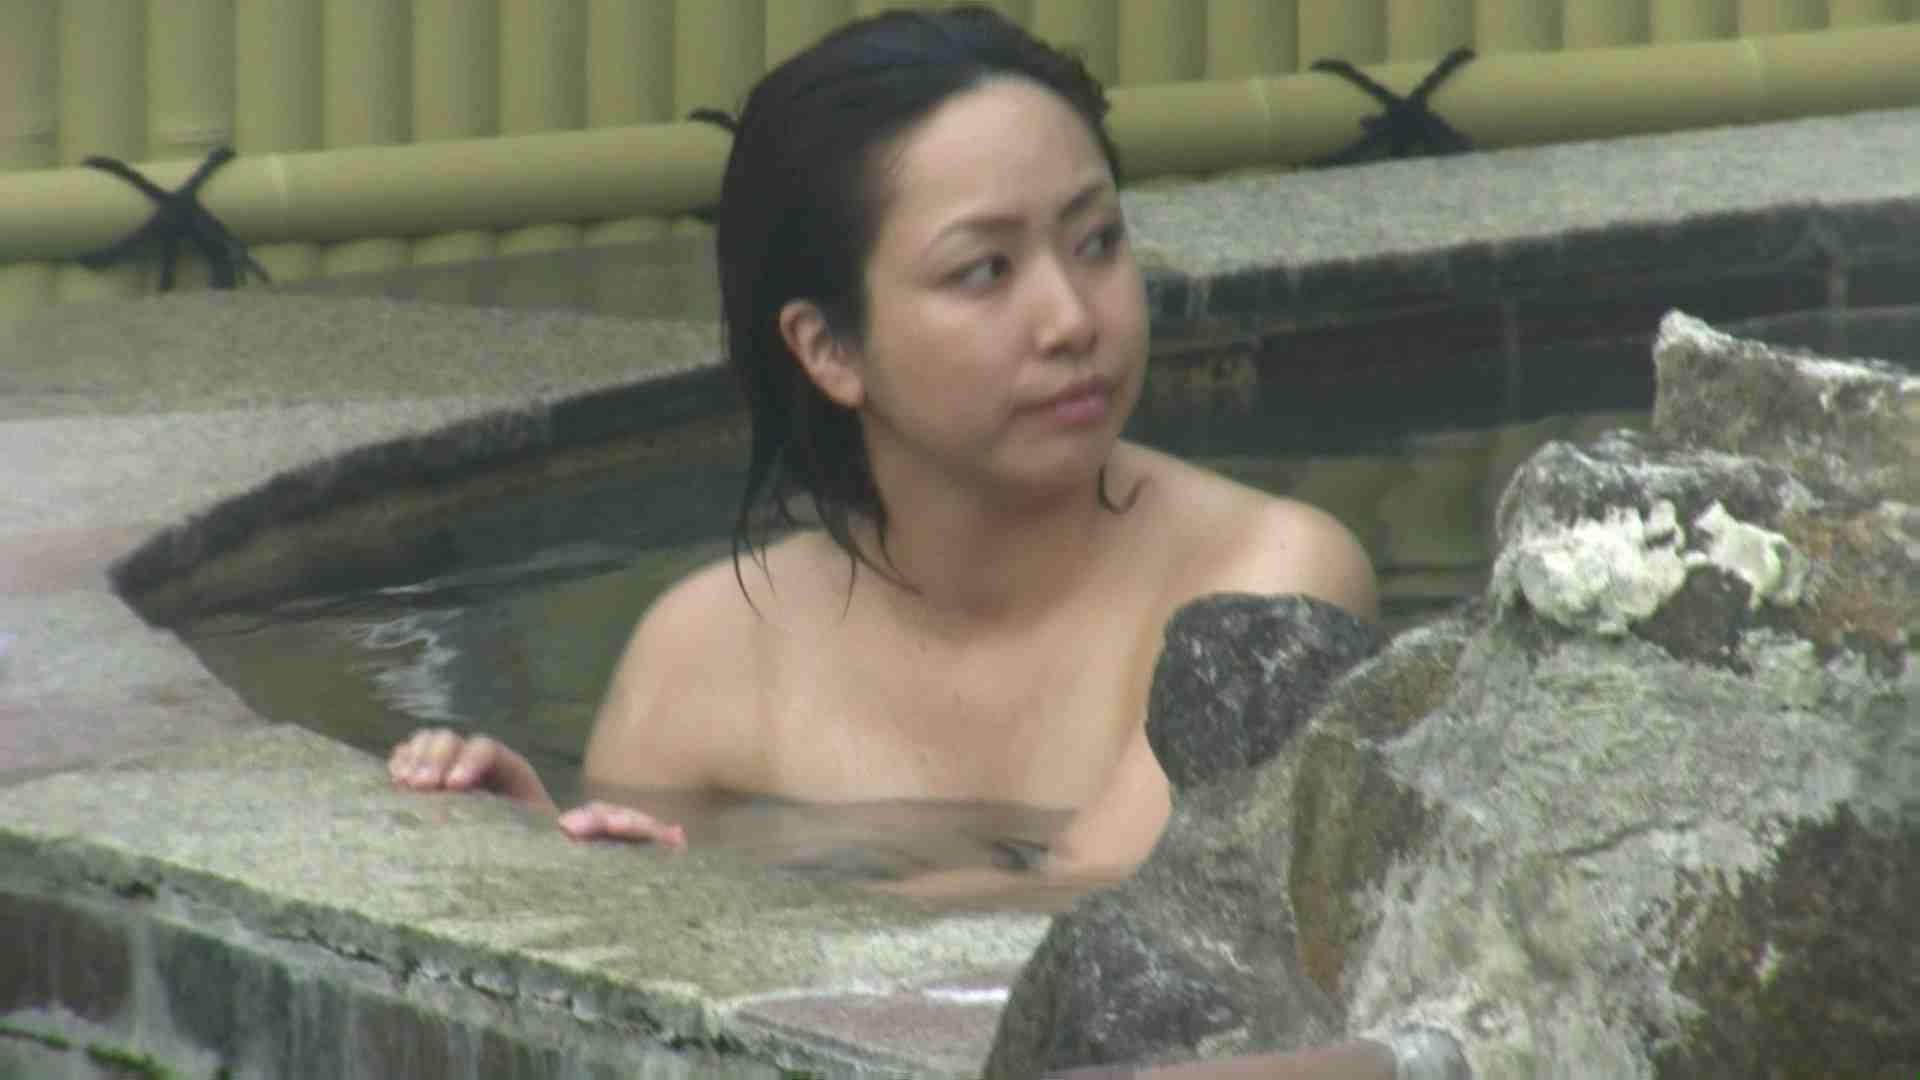 Aquaな露天風呂Vol.604 美しいOLの裸体 AV無料 78pic 2